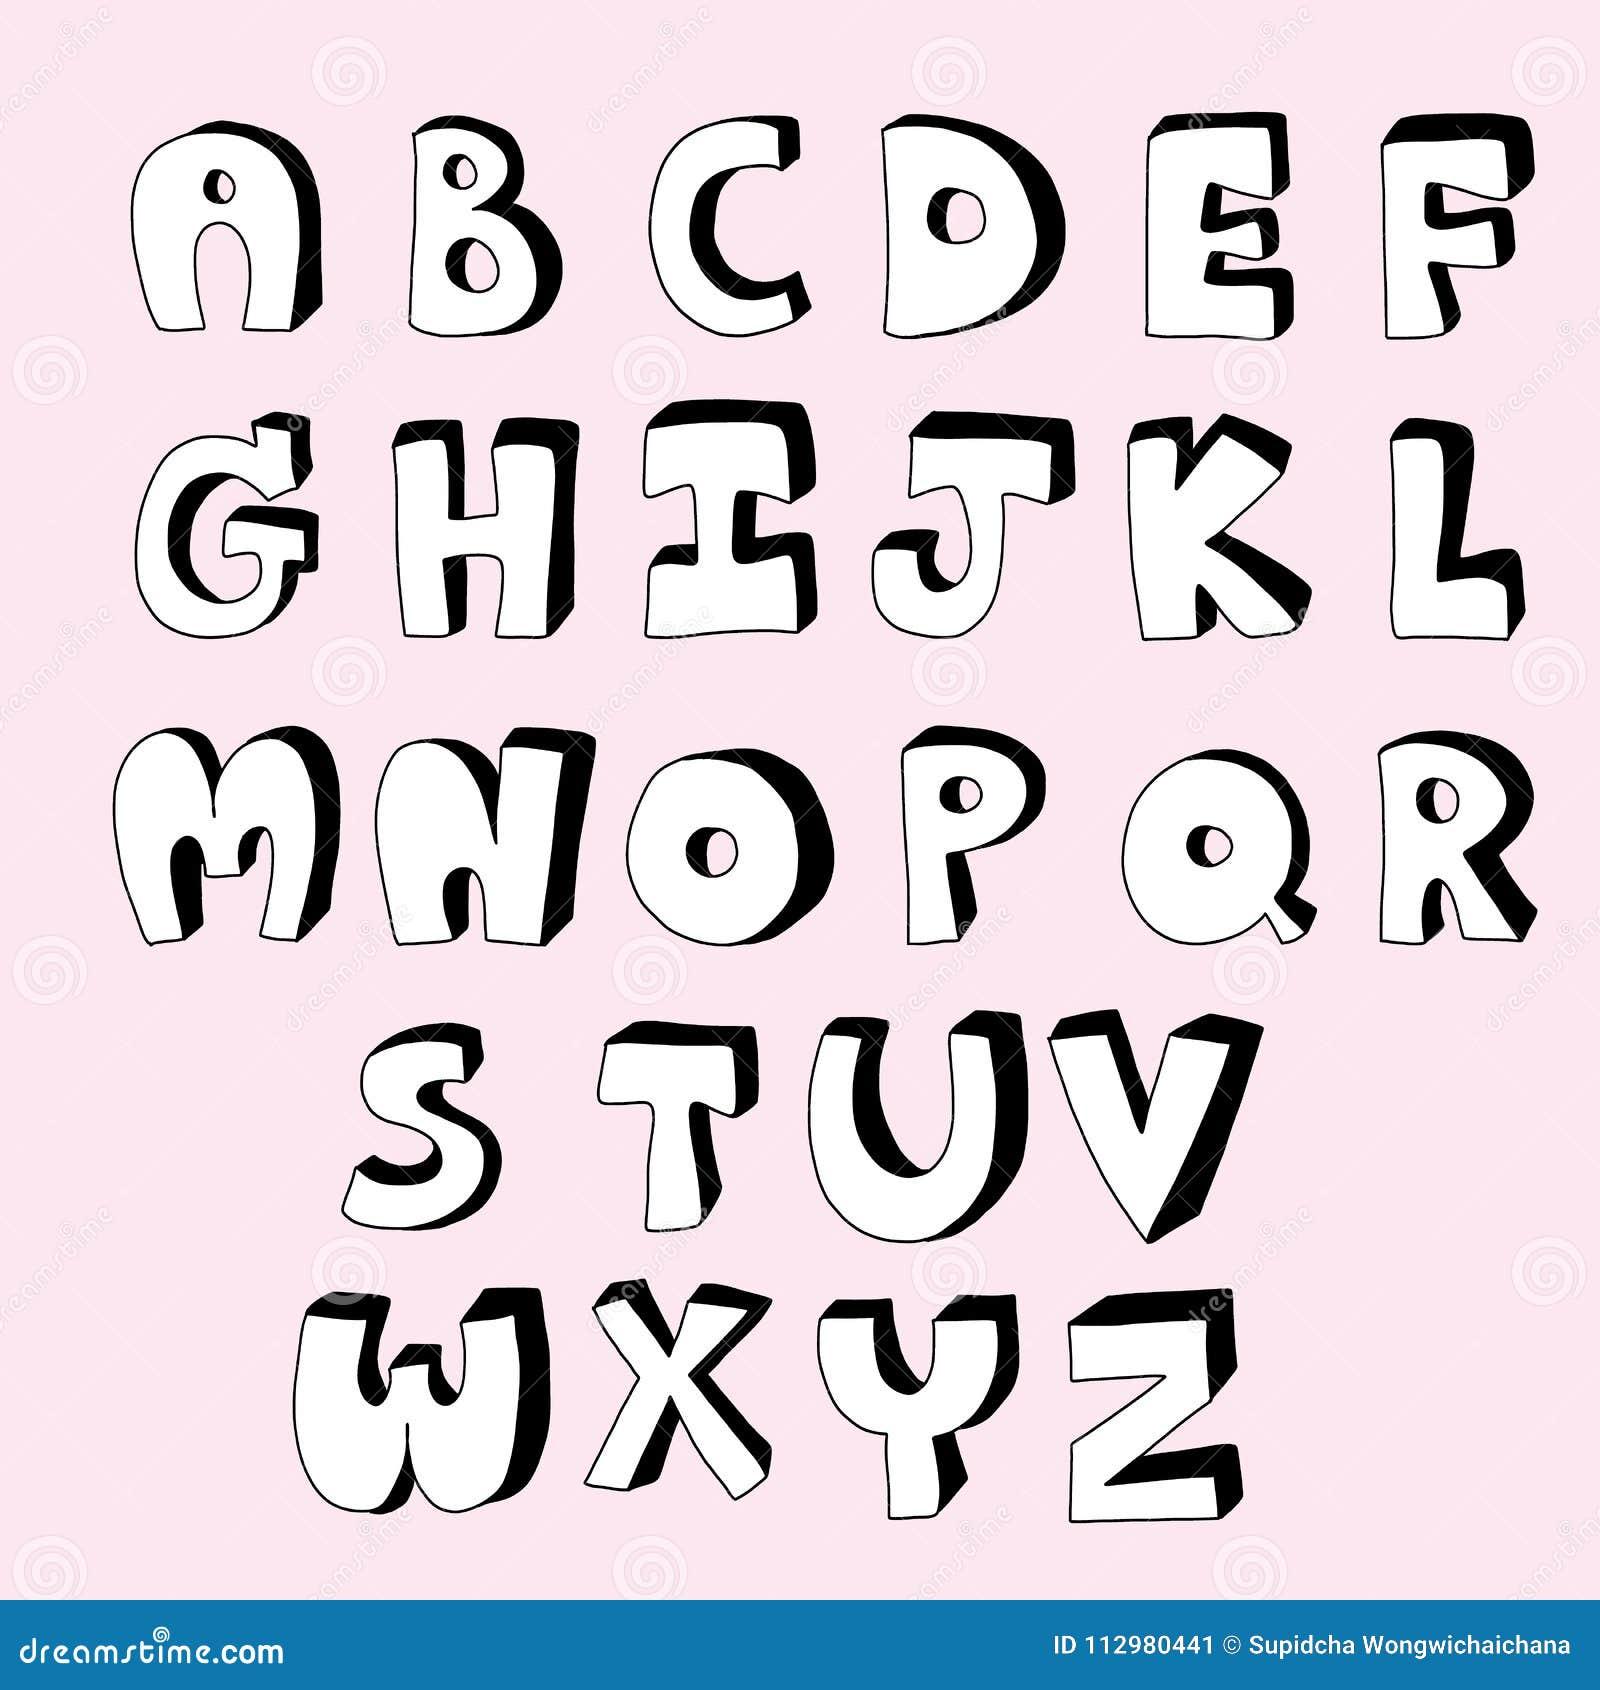 Black and white cute alphabet